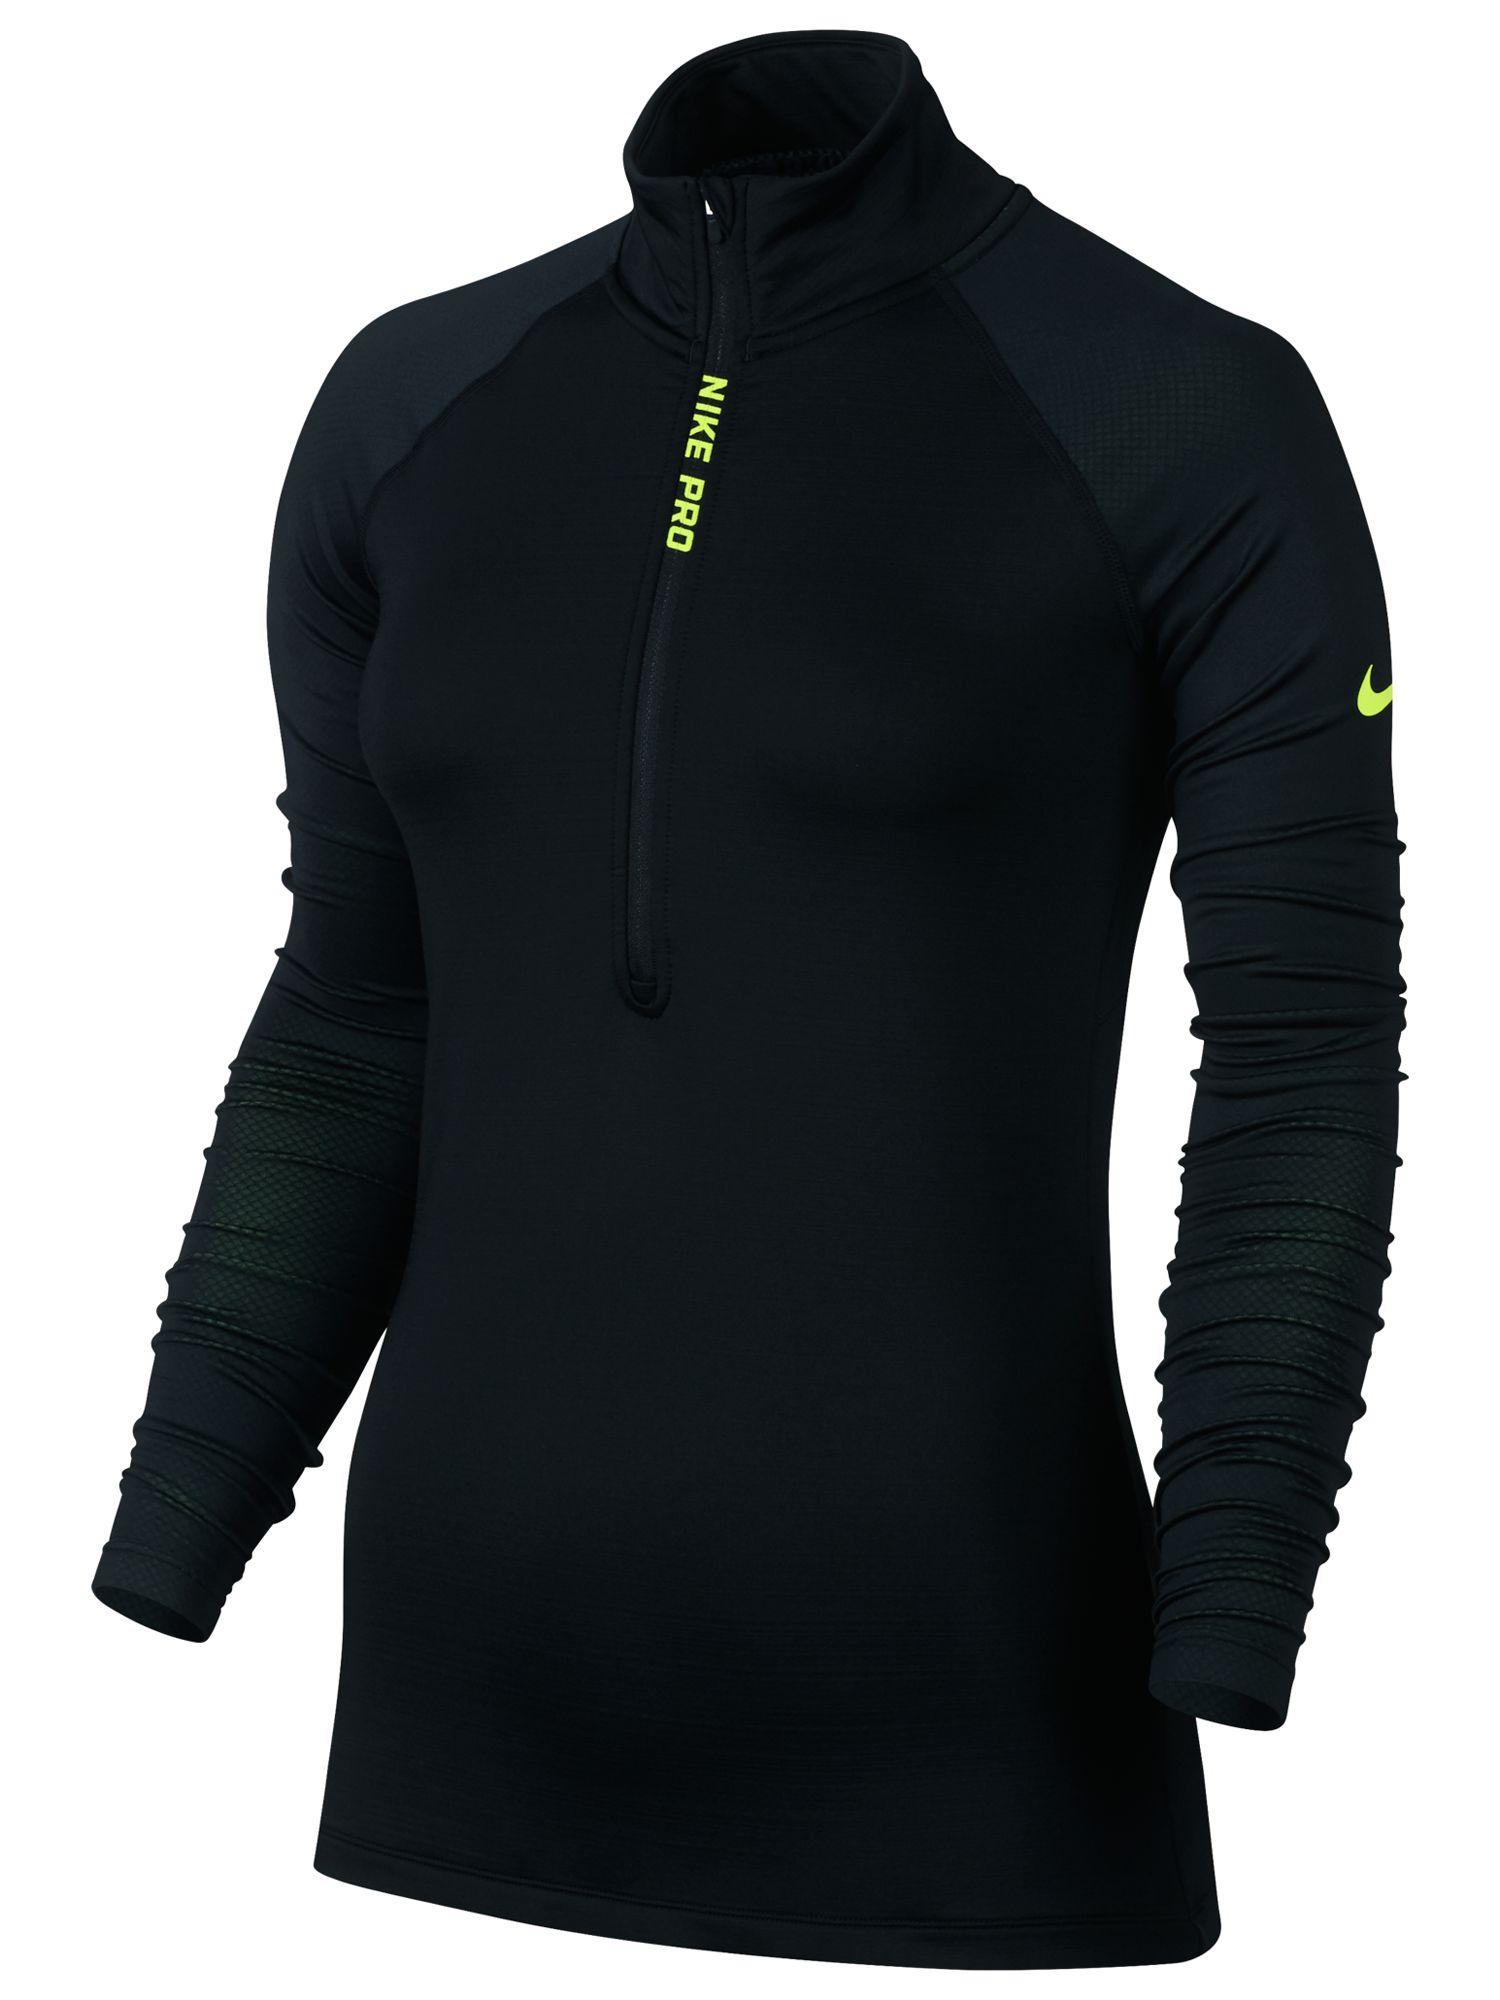 bf2489eff Nike Pro Hyperwarm Half Zip Training Top, Black/Volt at John Lewis &  Partners